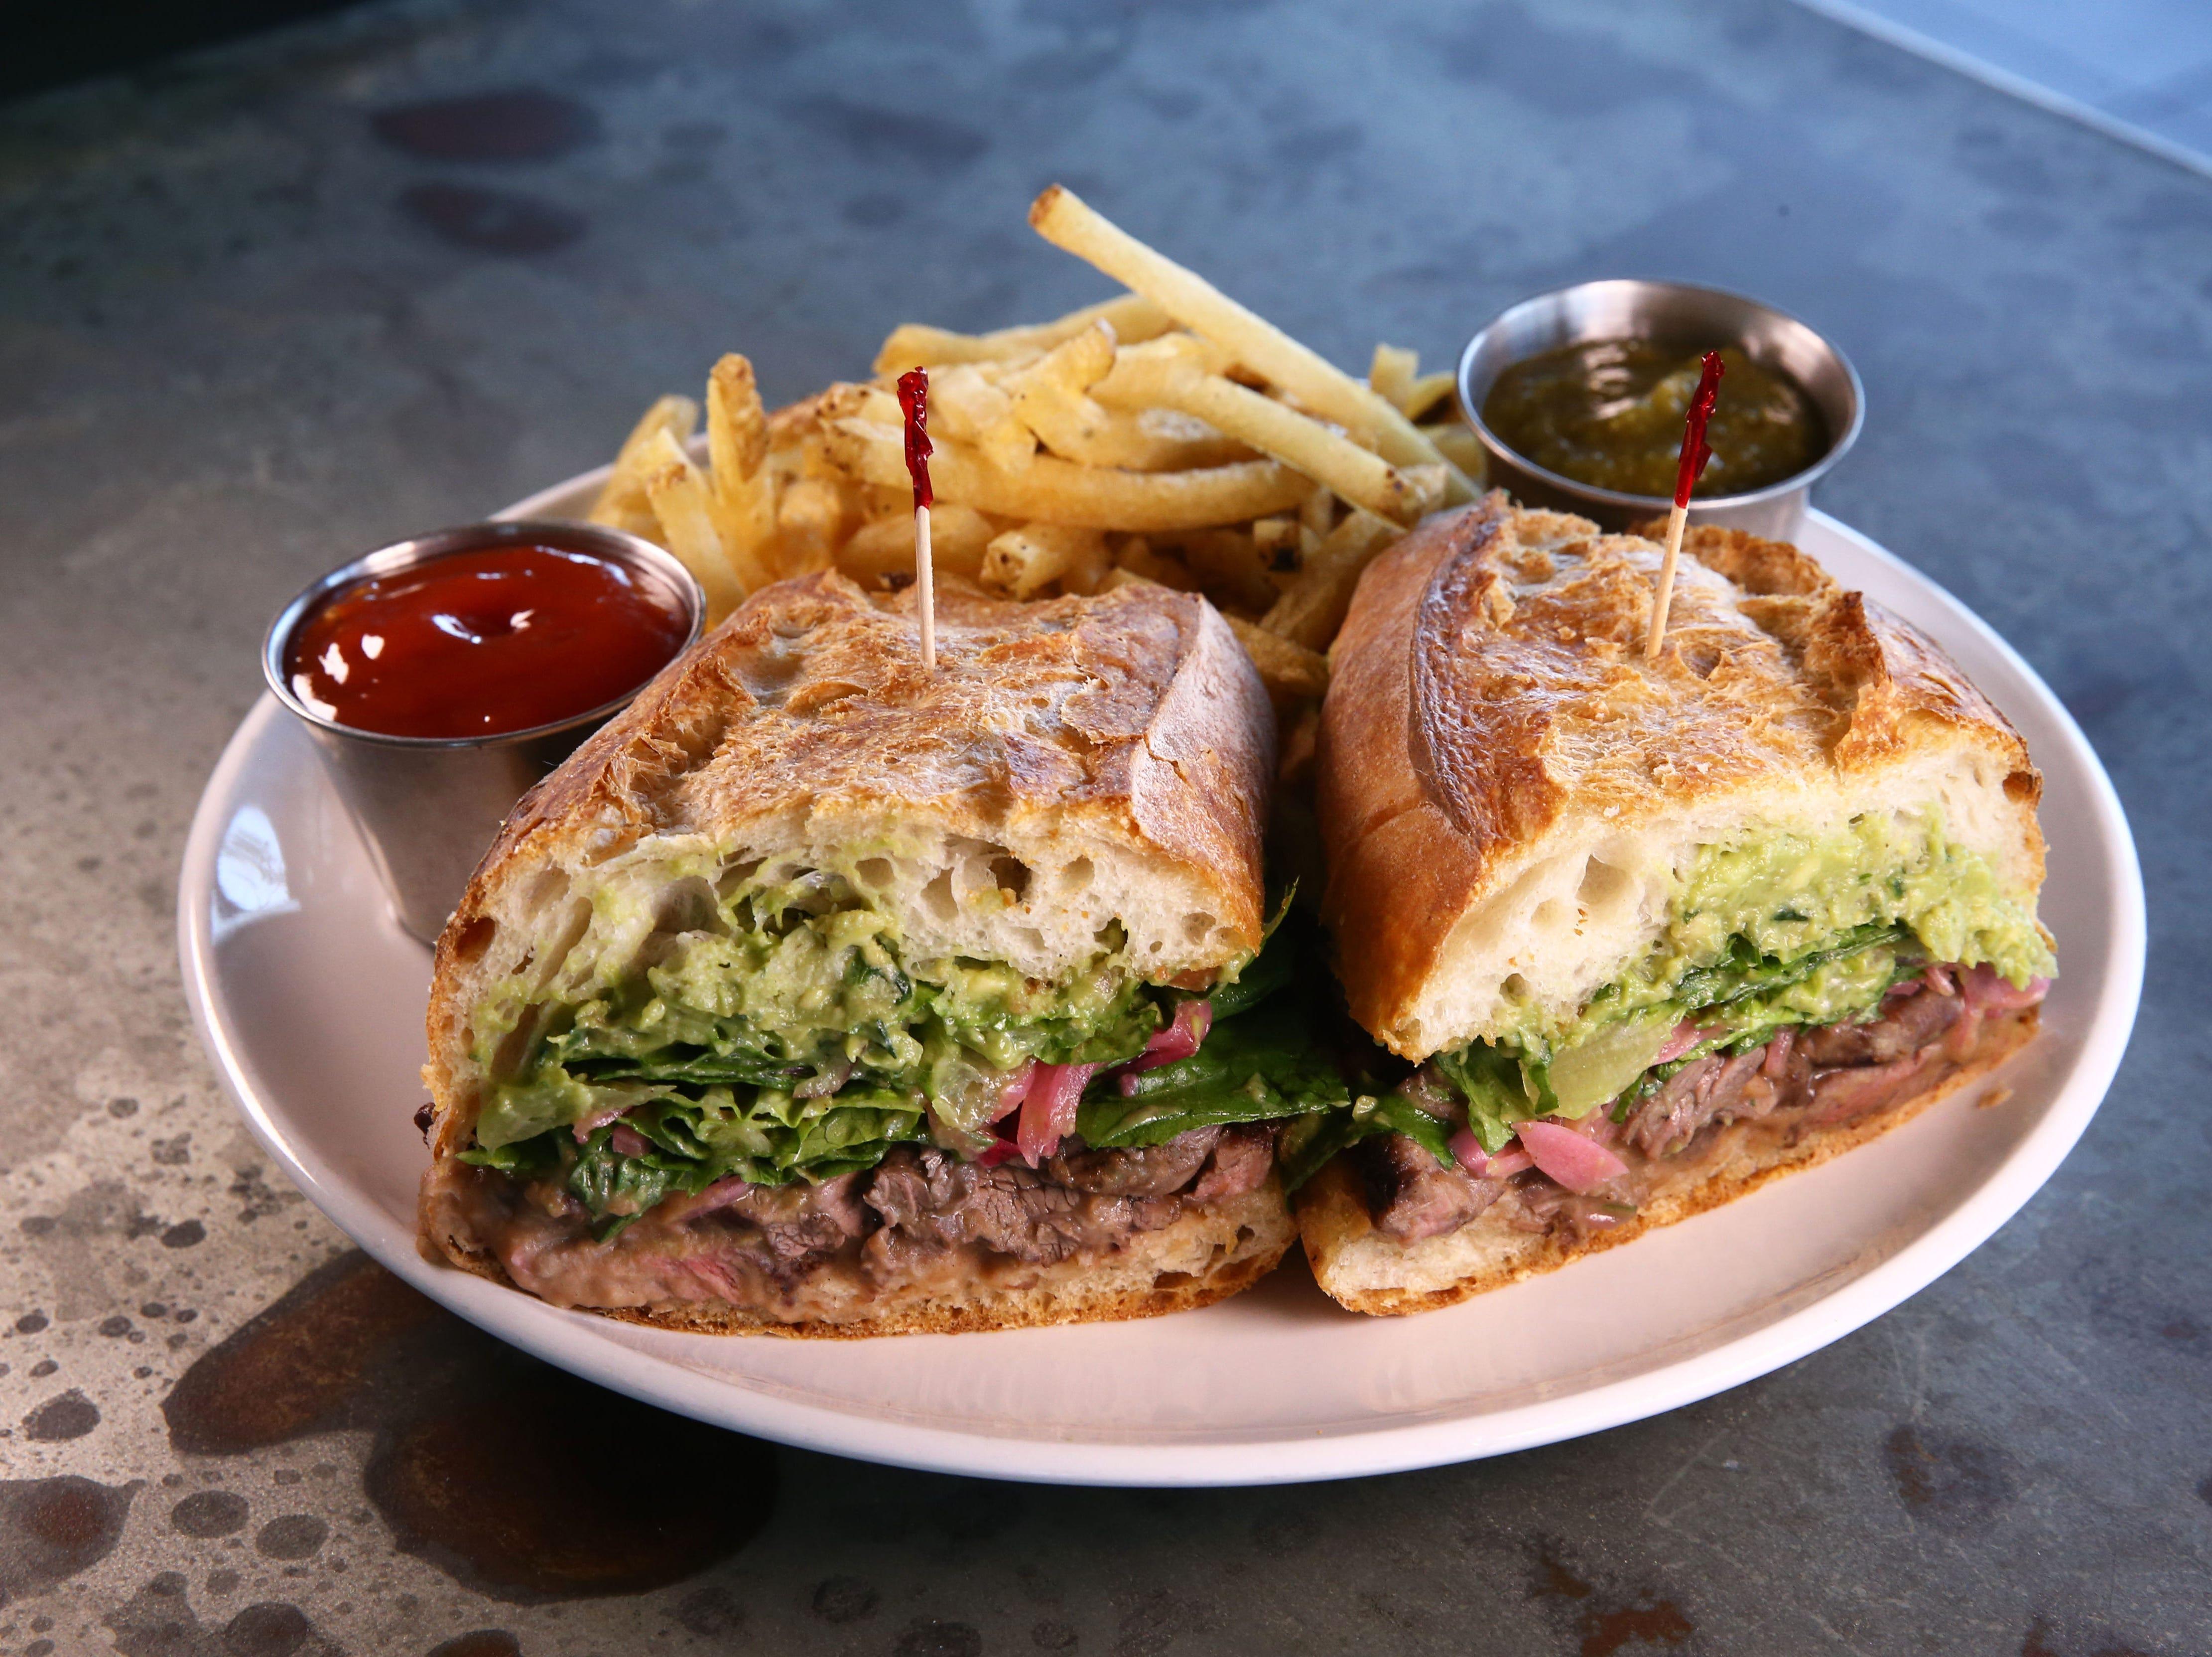 Carne Asada Sandwich at Roland's Cafe Market Bar on Aug. 20, 2018, in Phoenix, Ariz.